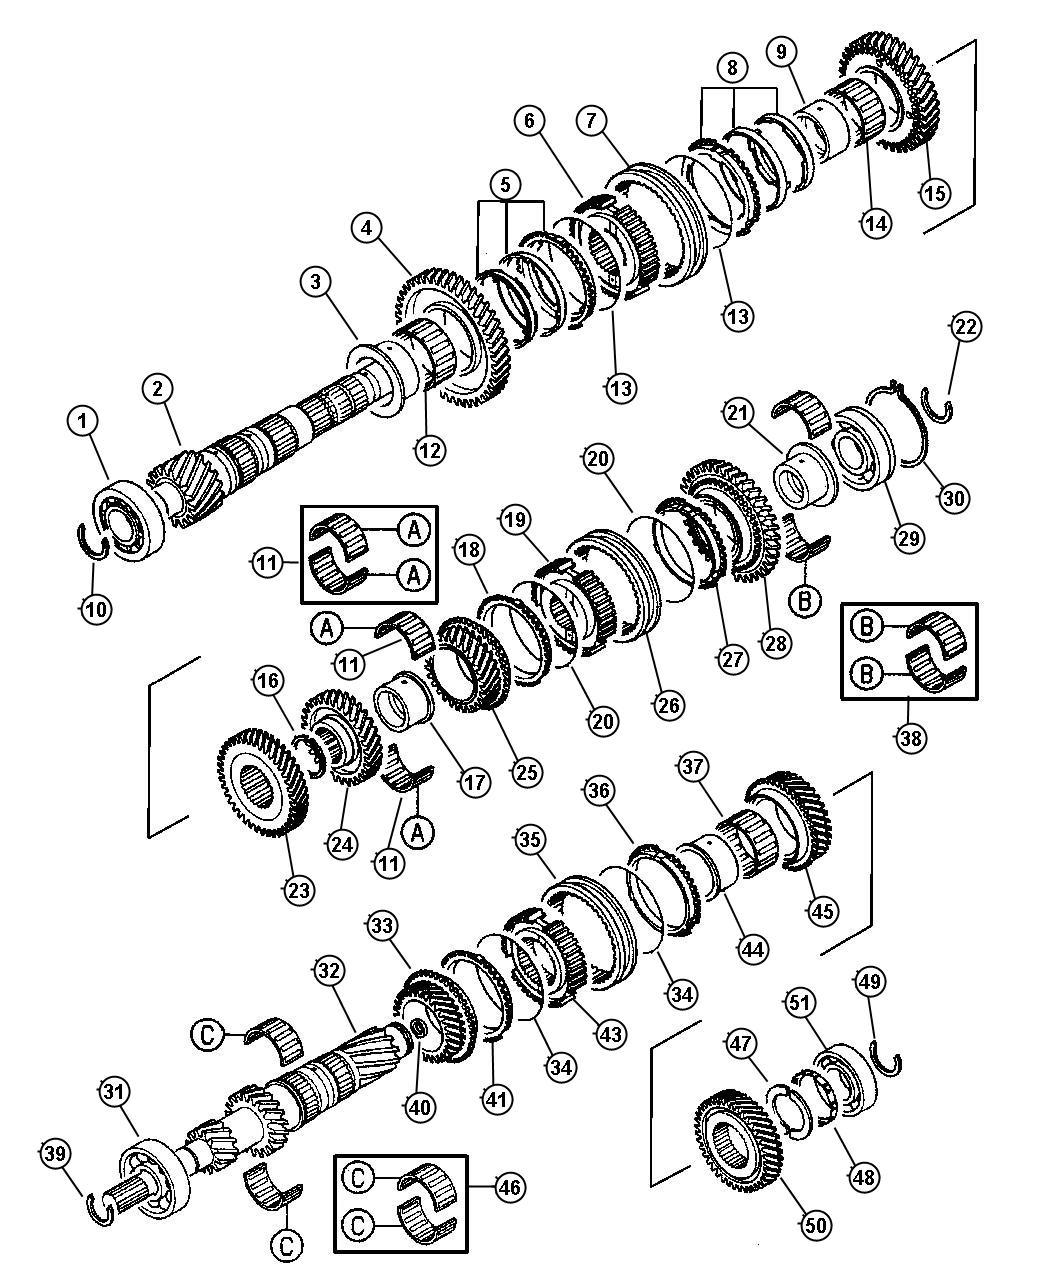 Chrysler Sebring Gear. Input. [4th speed], [car and truck